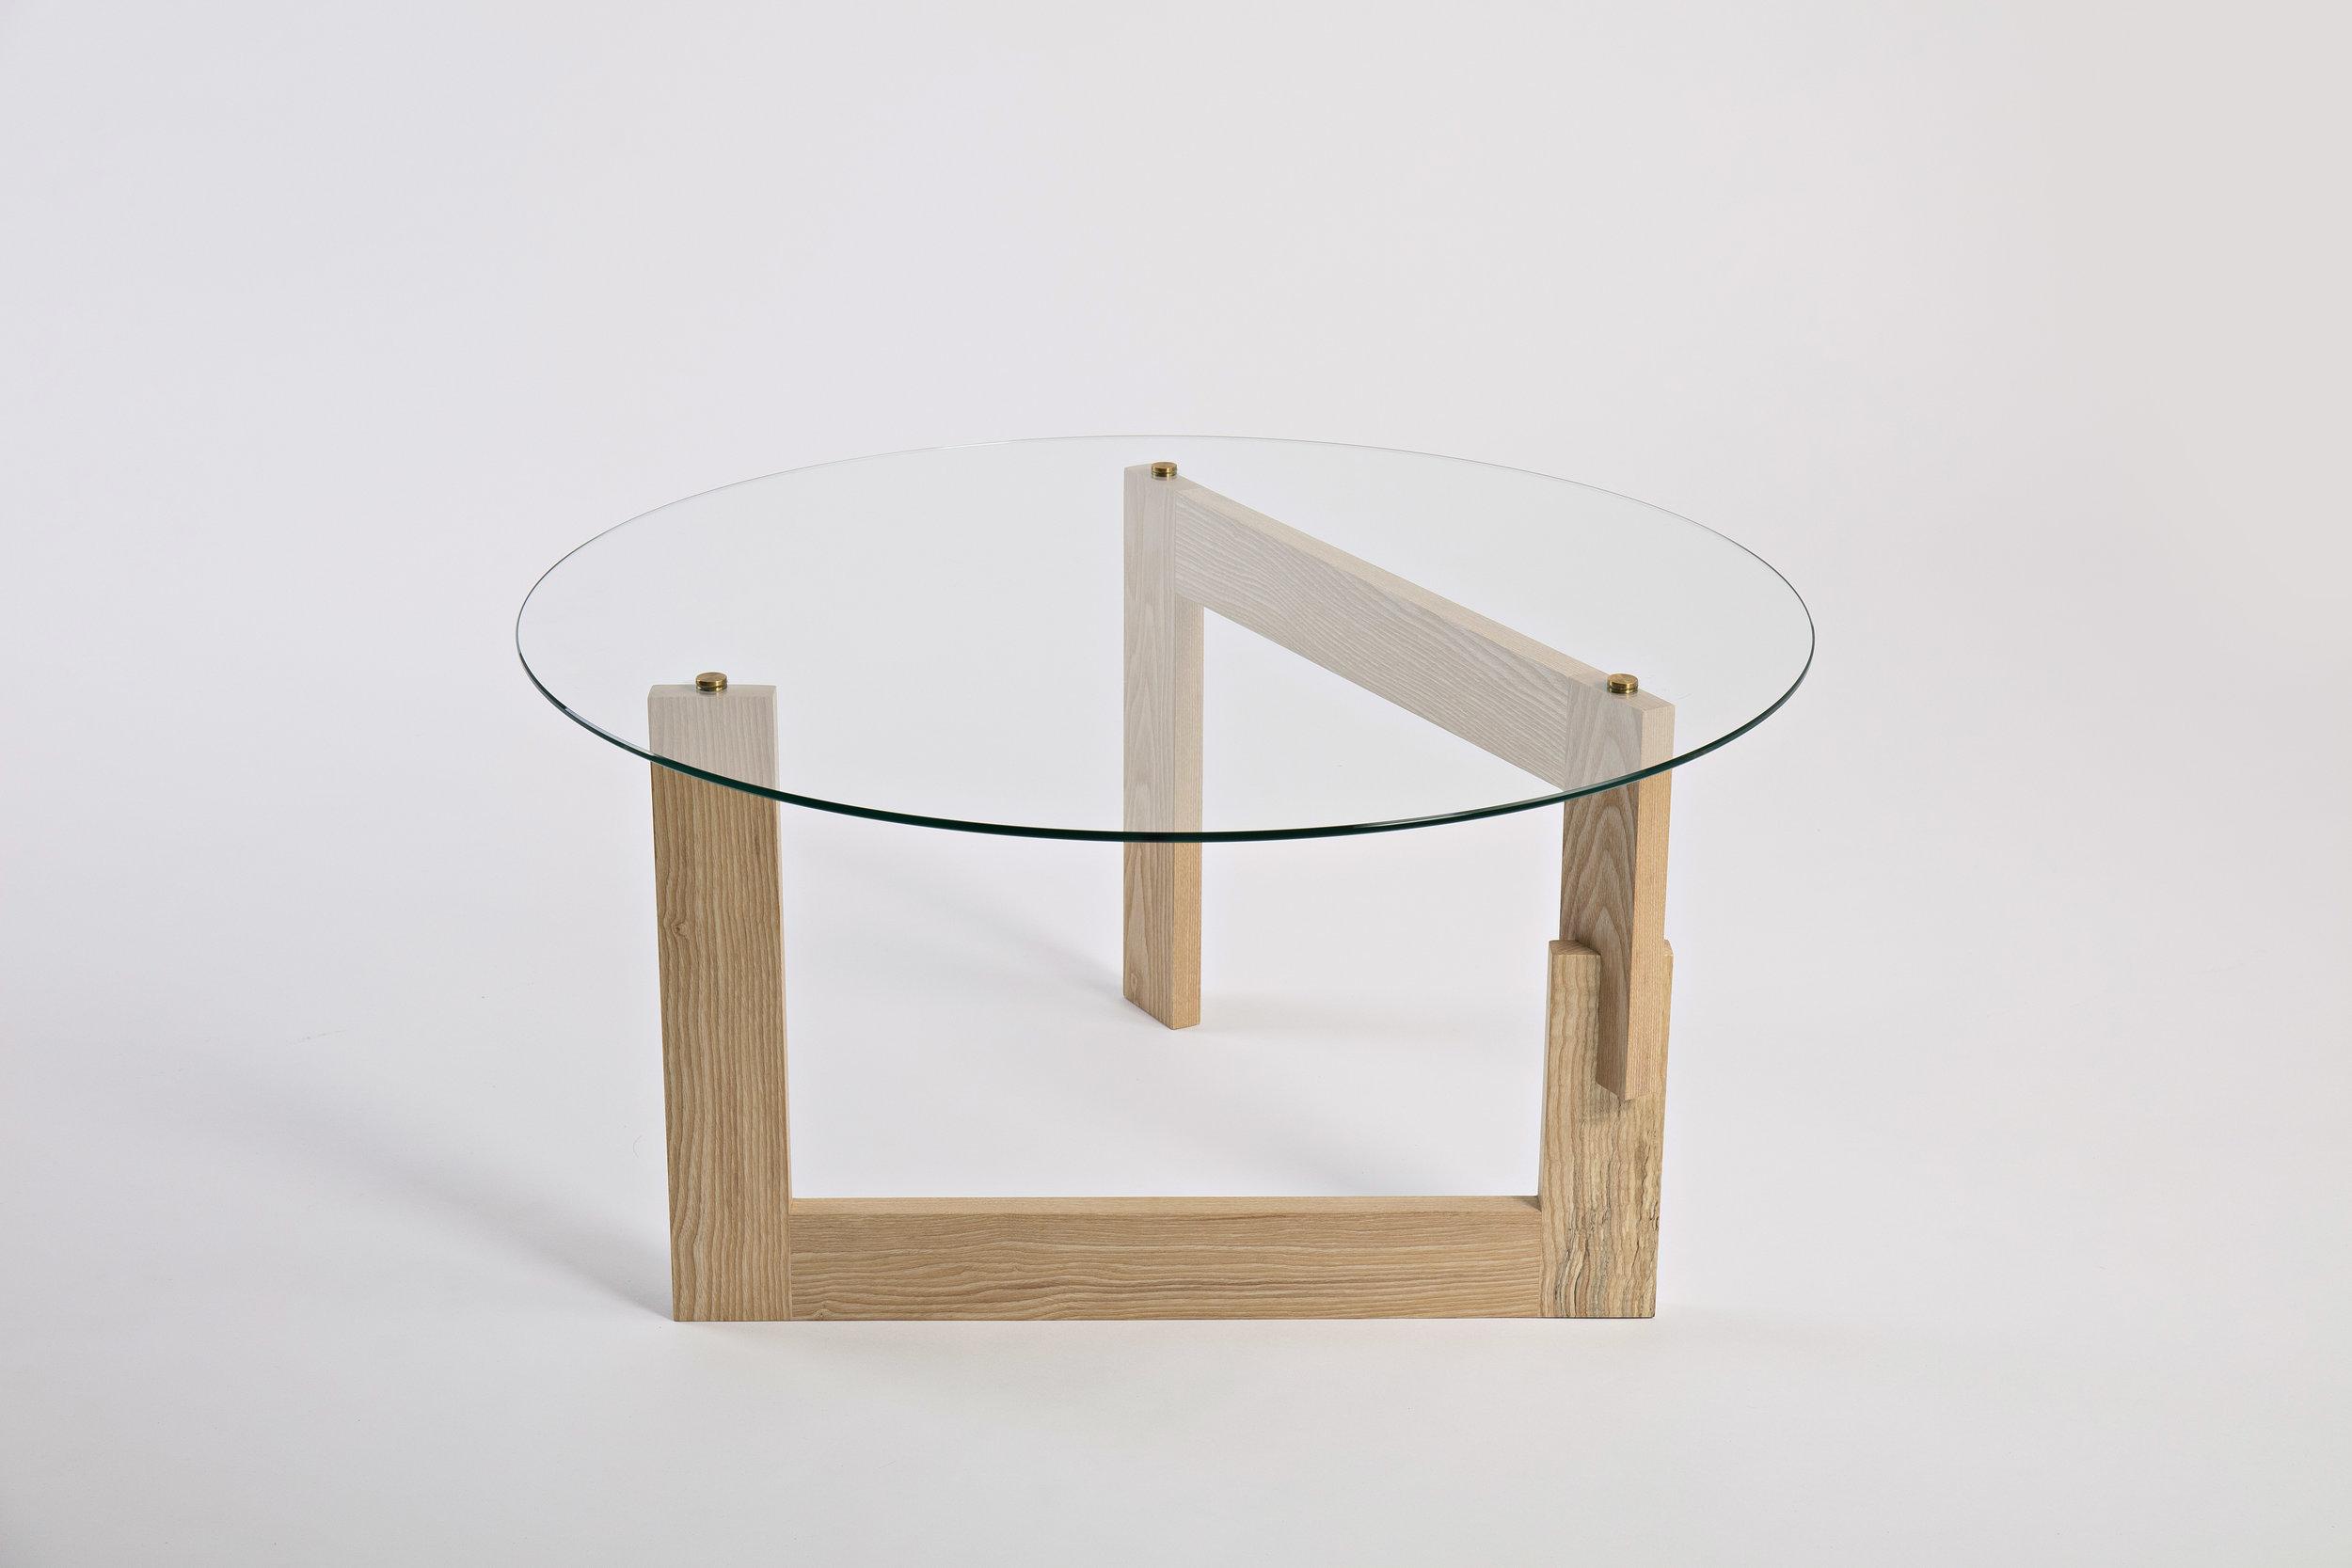 flop_flip_table_colin_harris_03.jpg